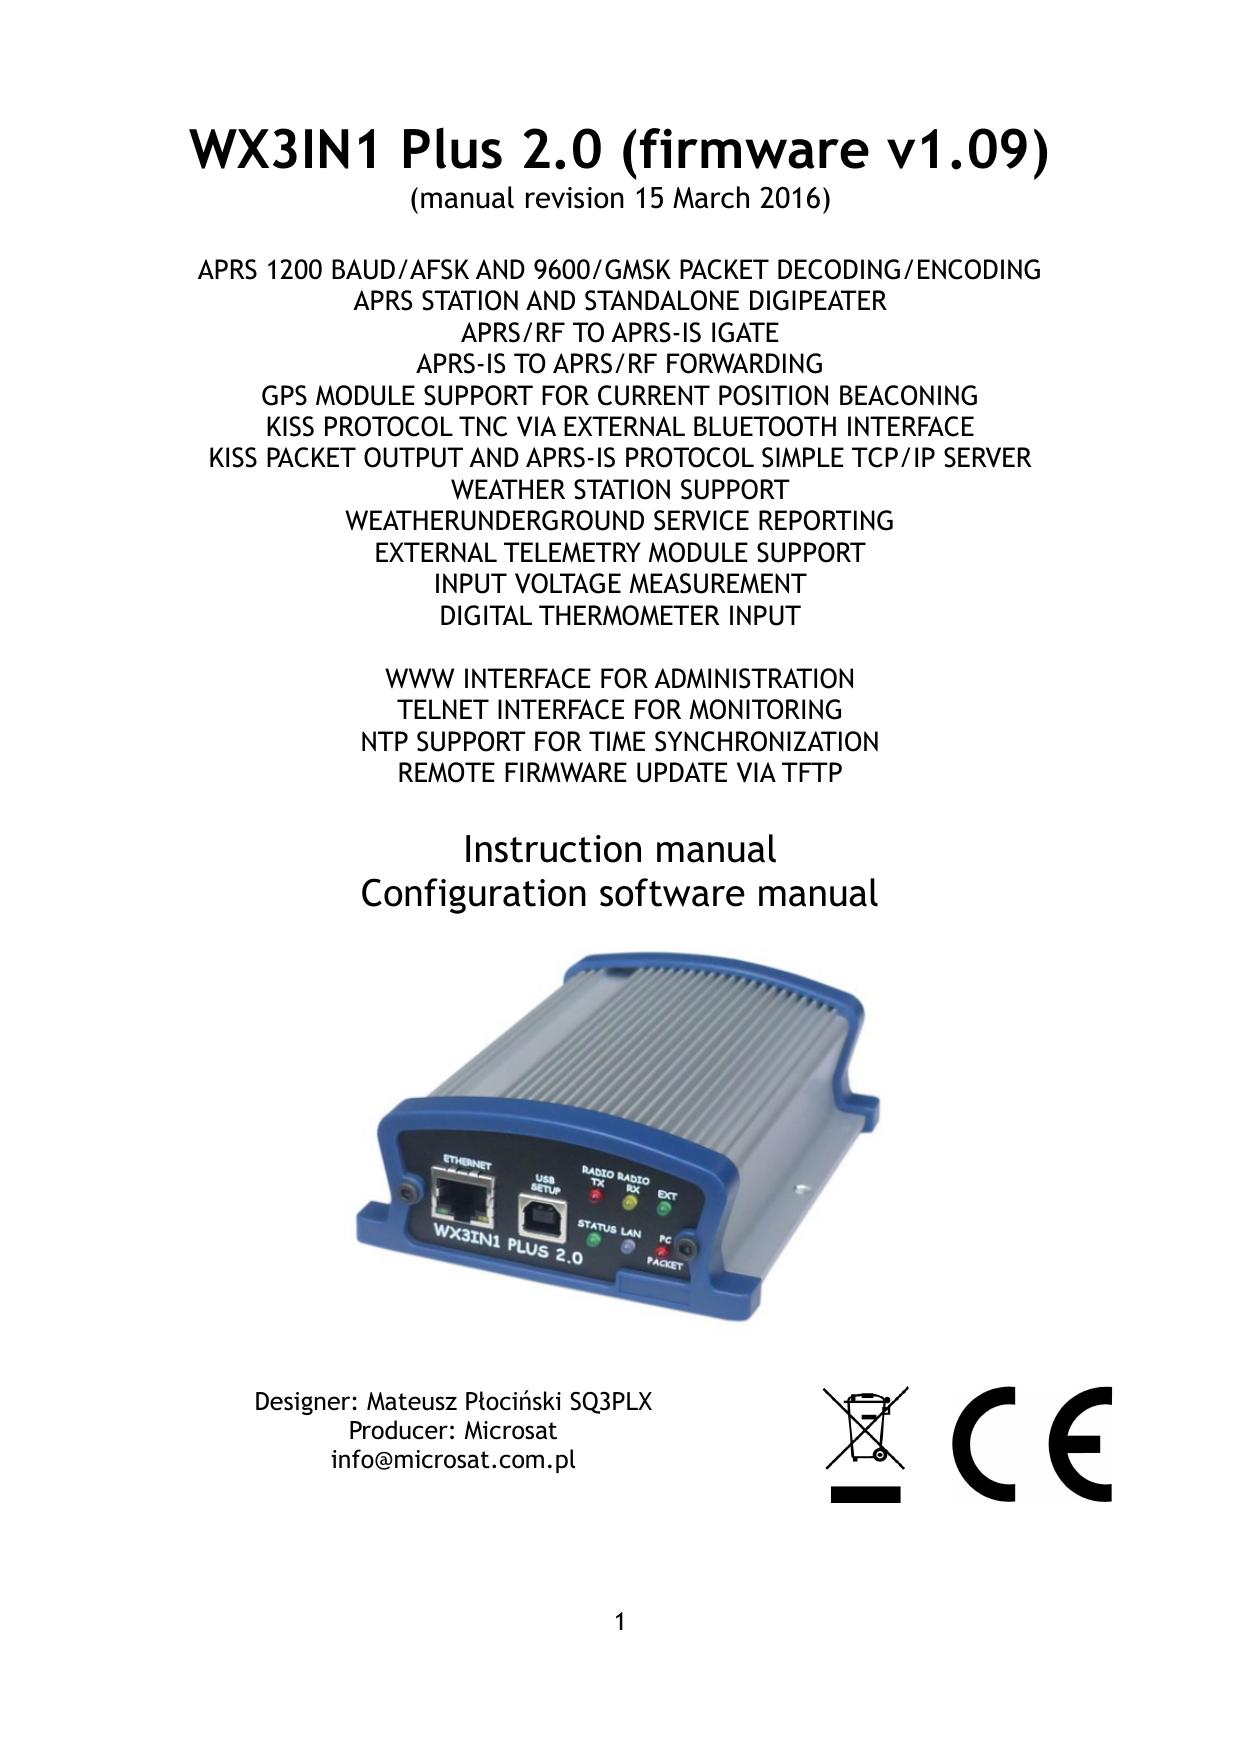 WX3IN1 Plus 2 0 (firmware v1 09) | manualzz com